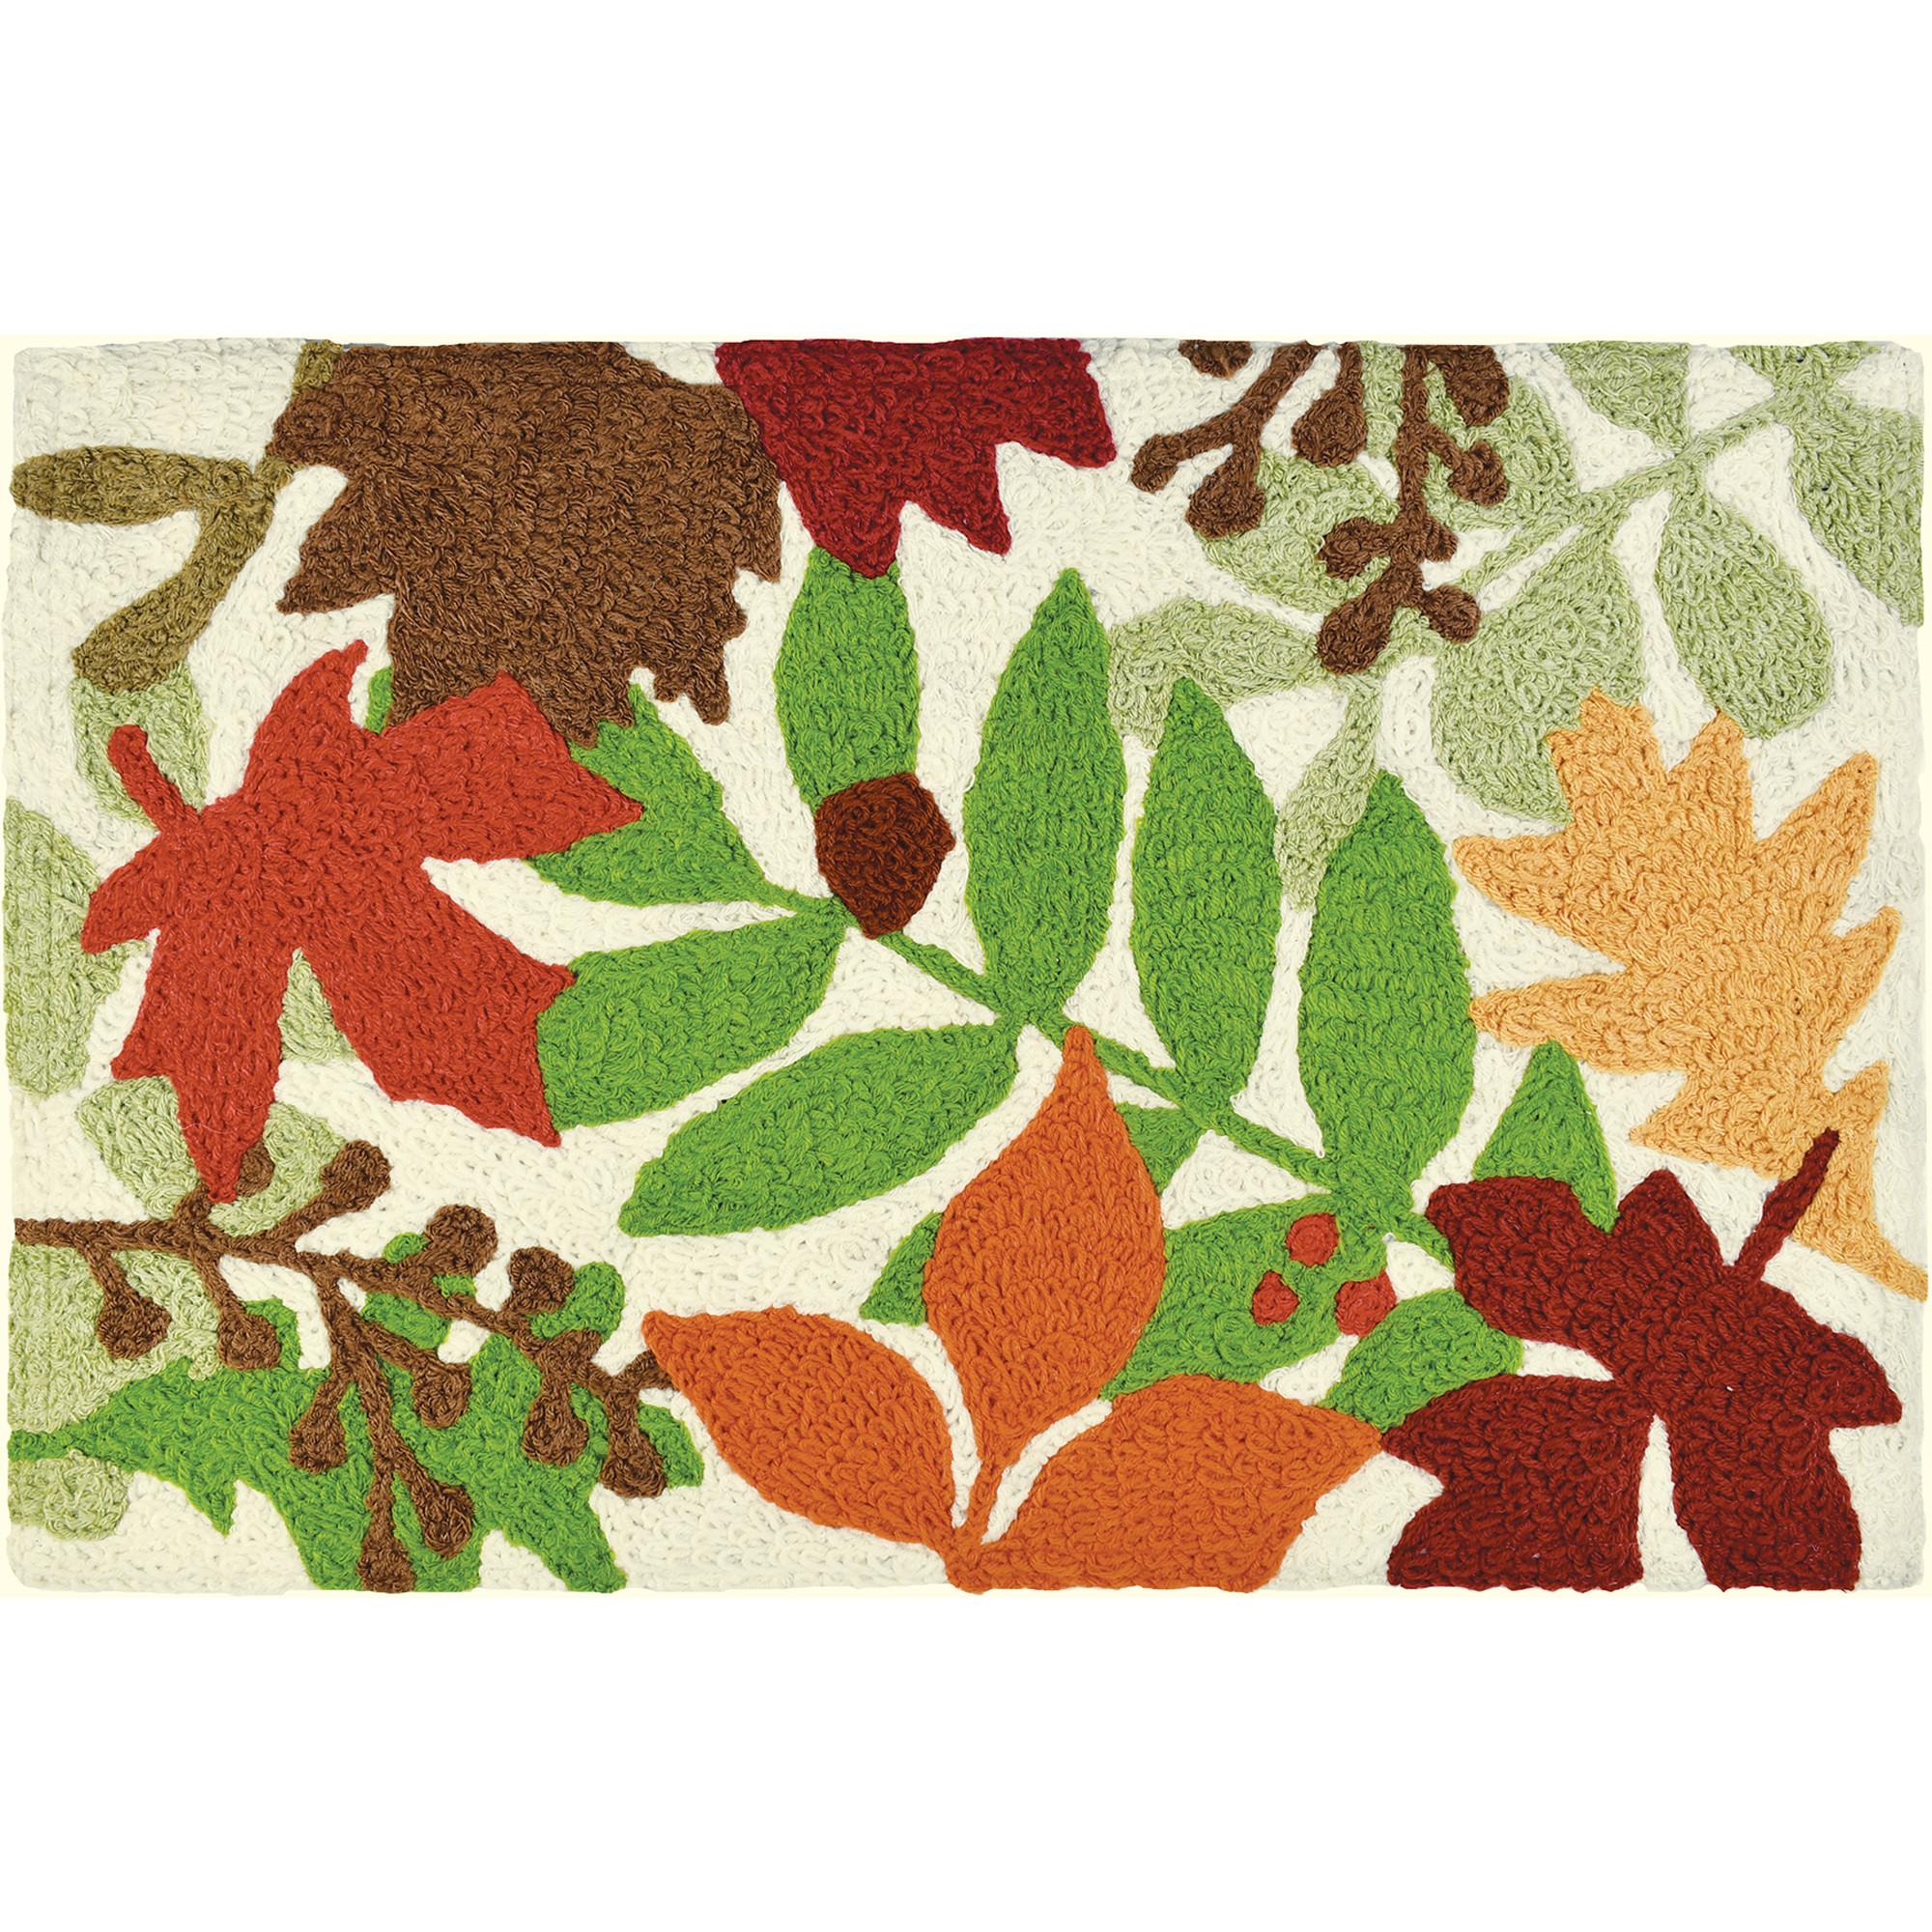 Autumn Forest Floor